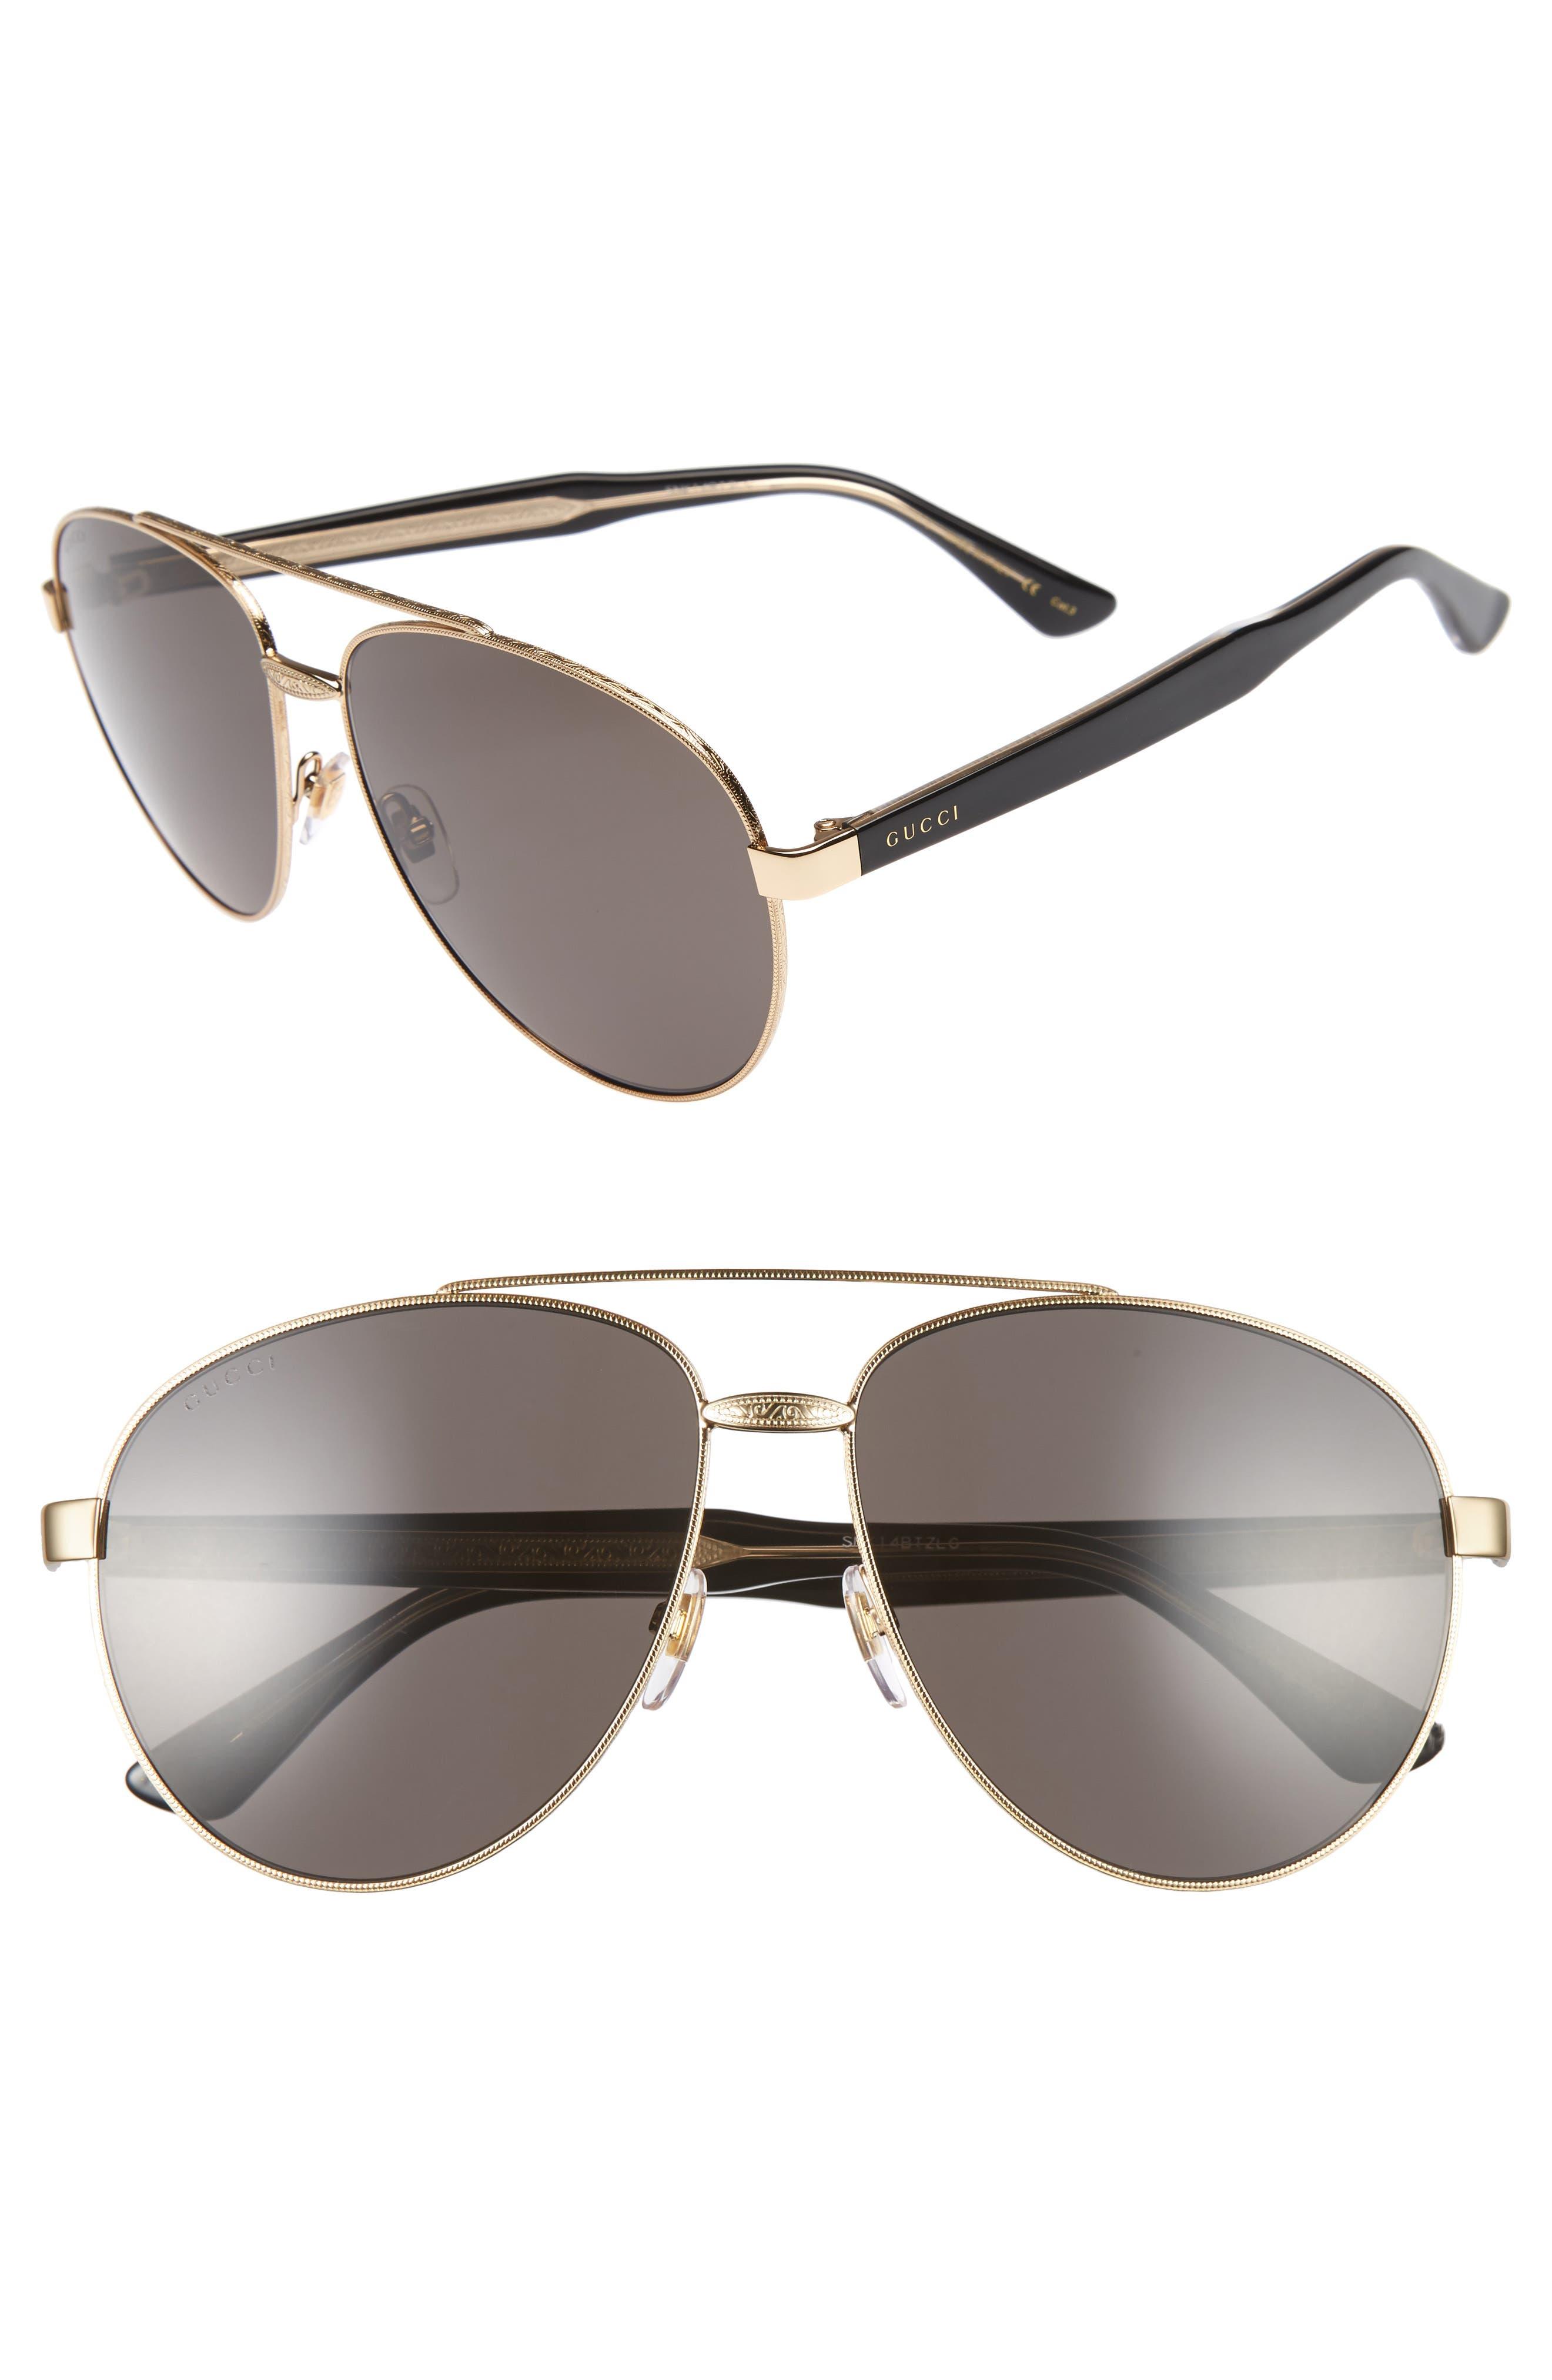 61mm Aviator Sunglasses,                         Main,                         color, 710